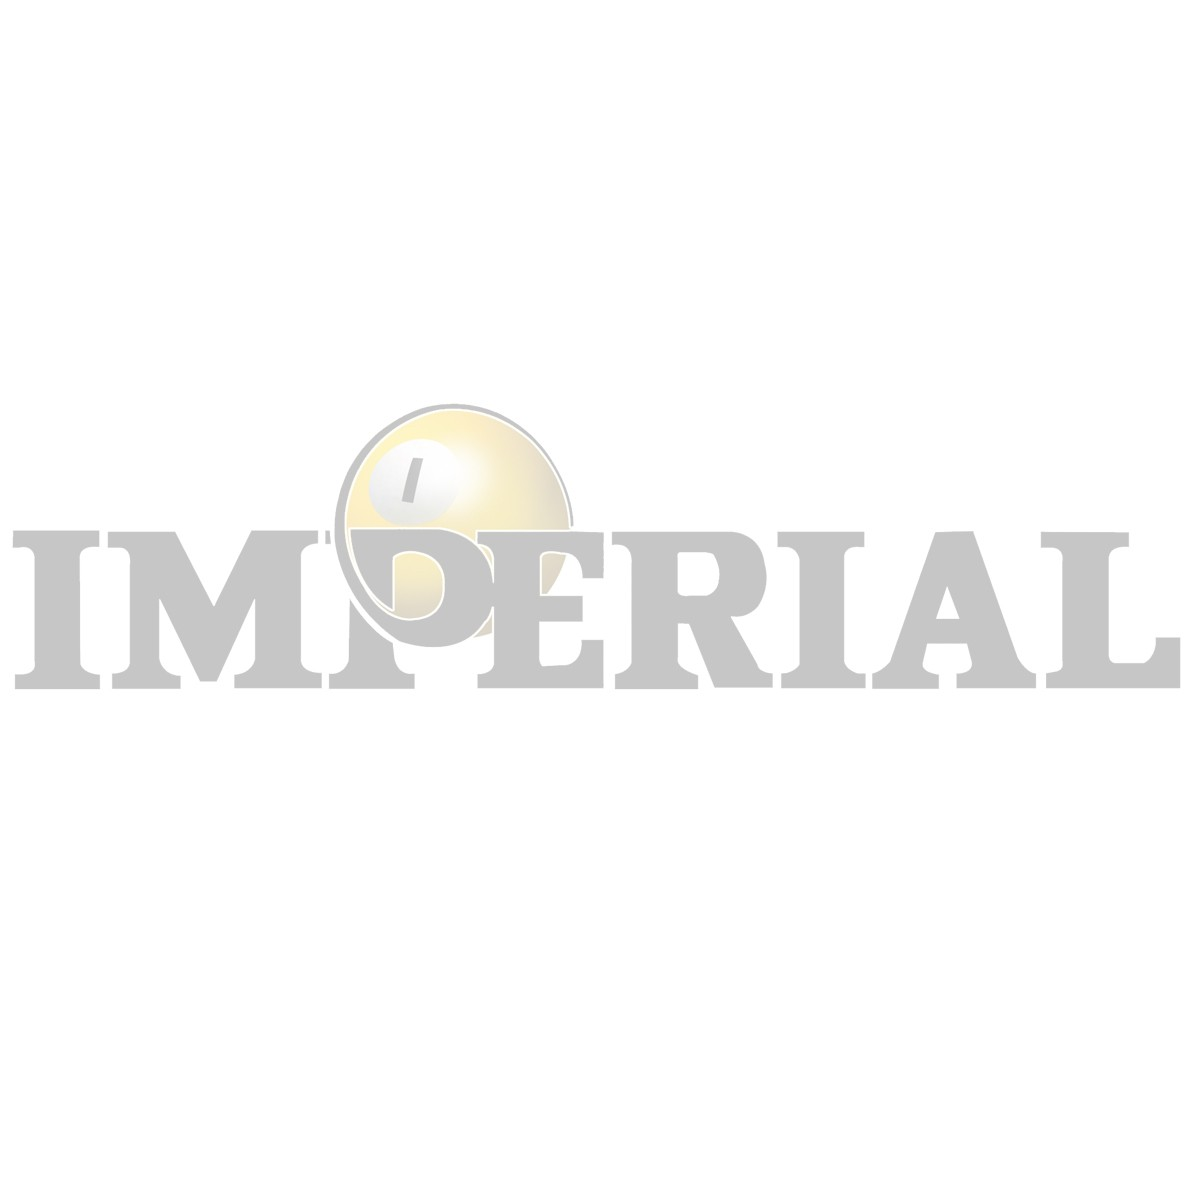 Michigan State Home vs. Away Billiard Ball Set